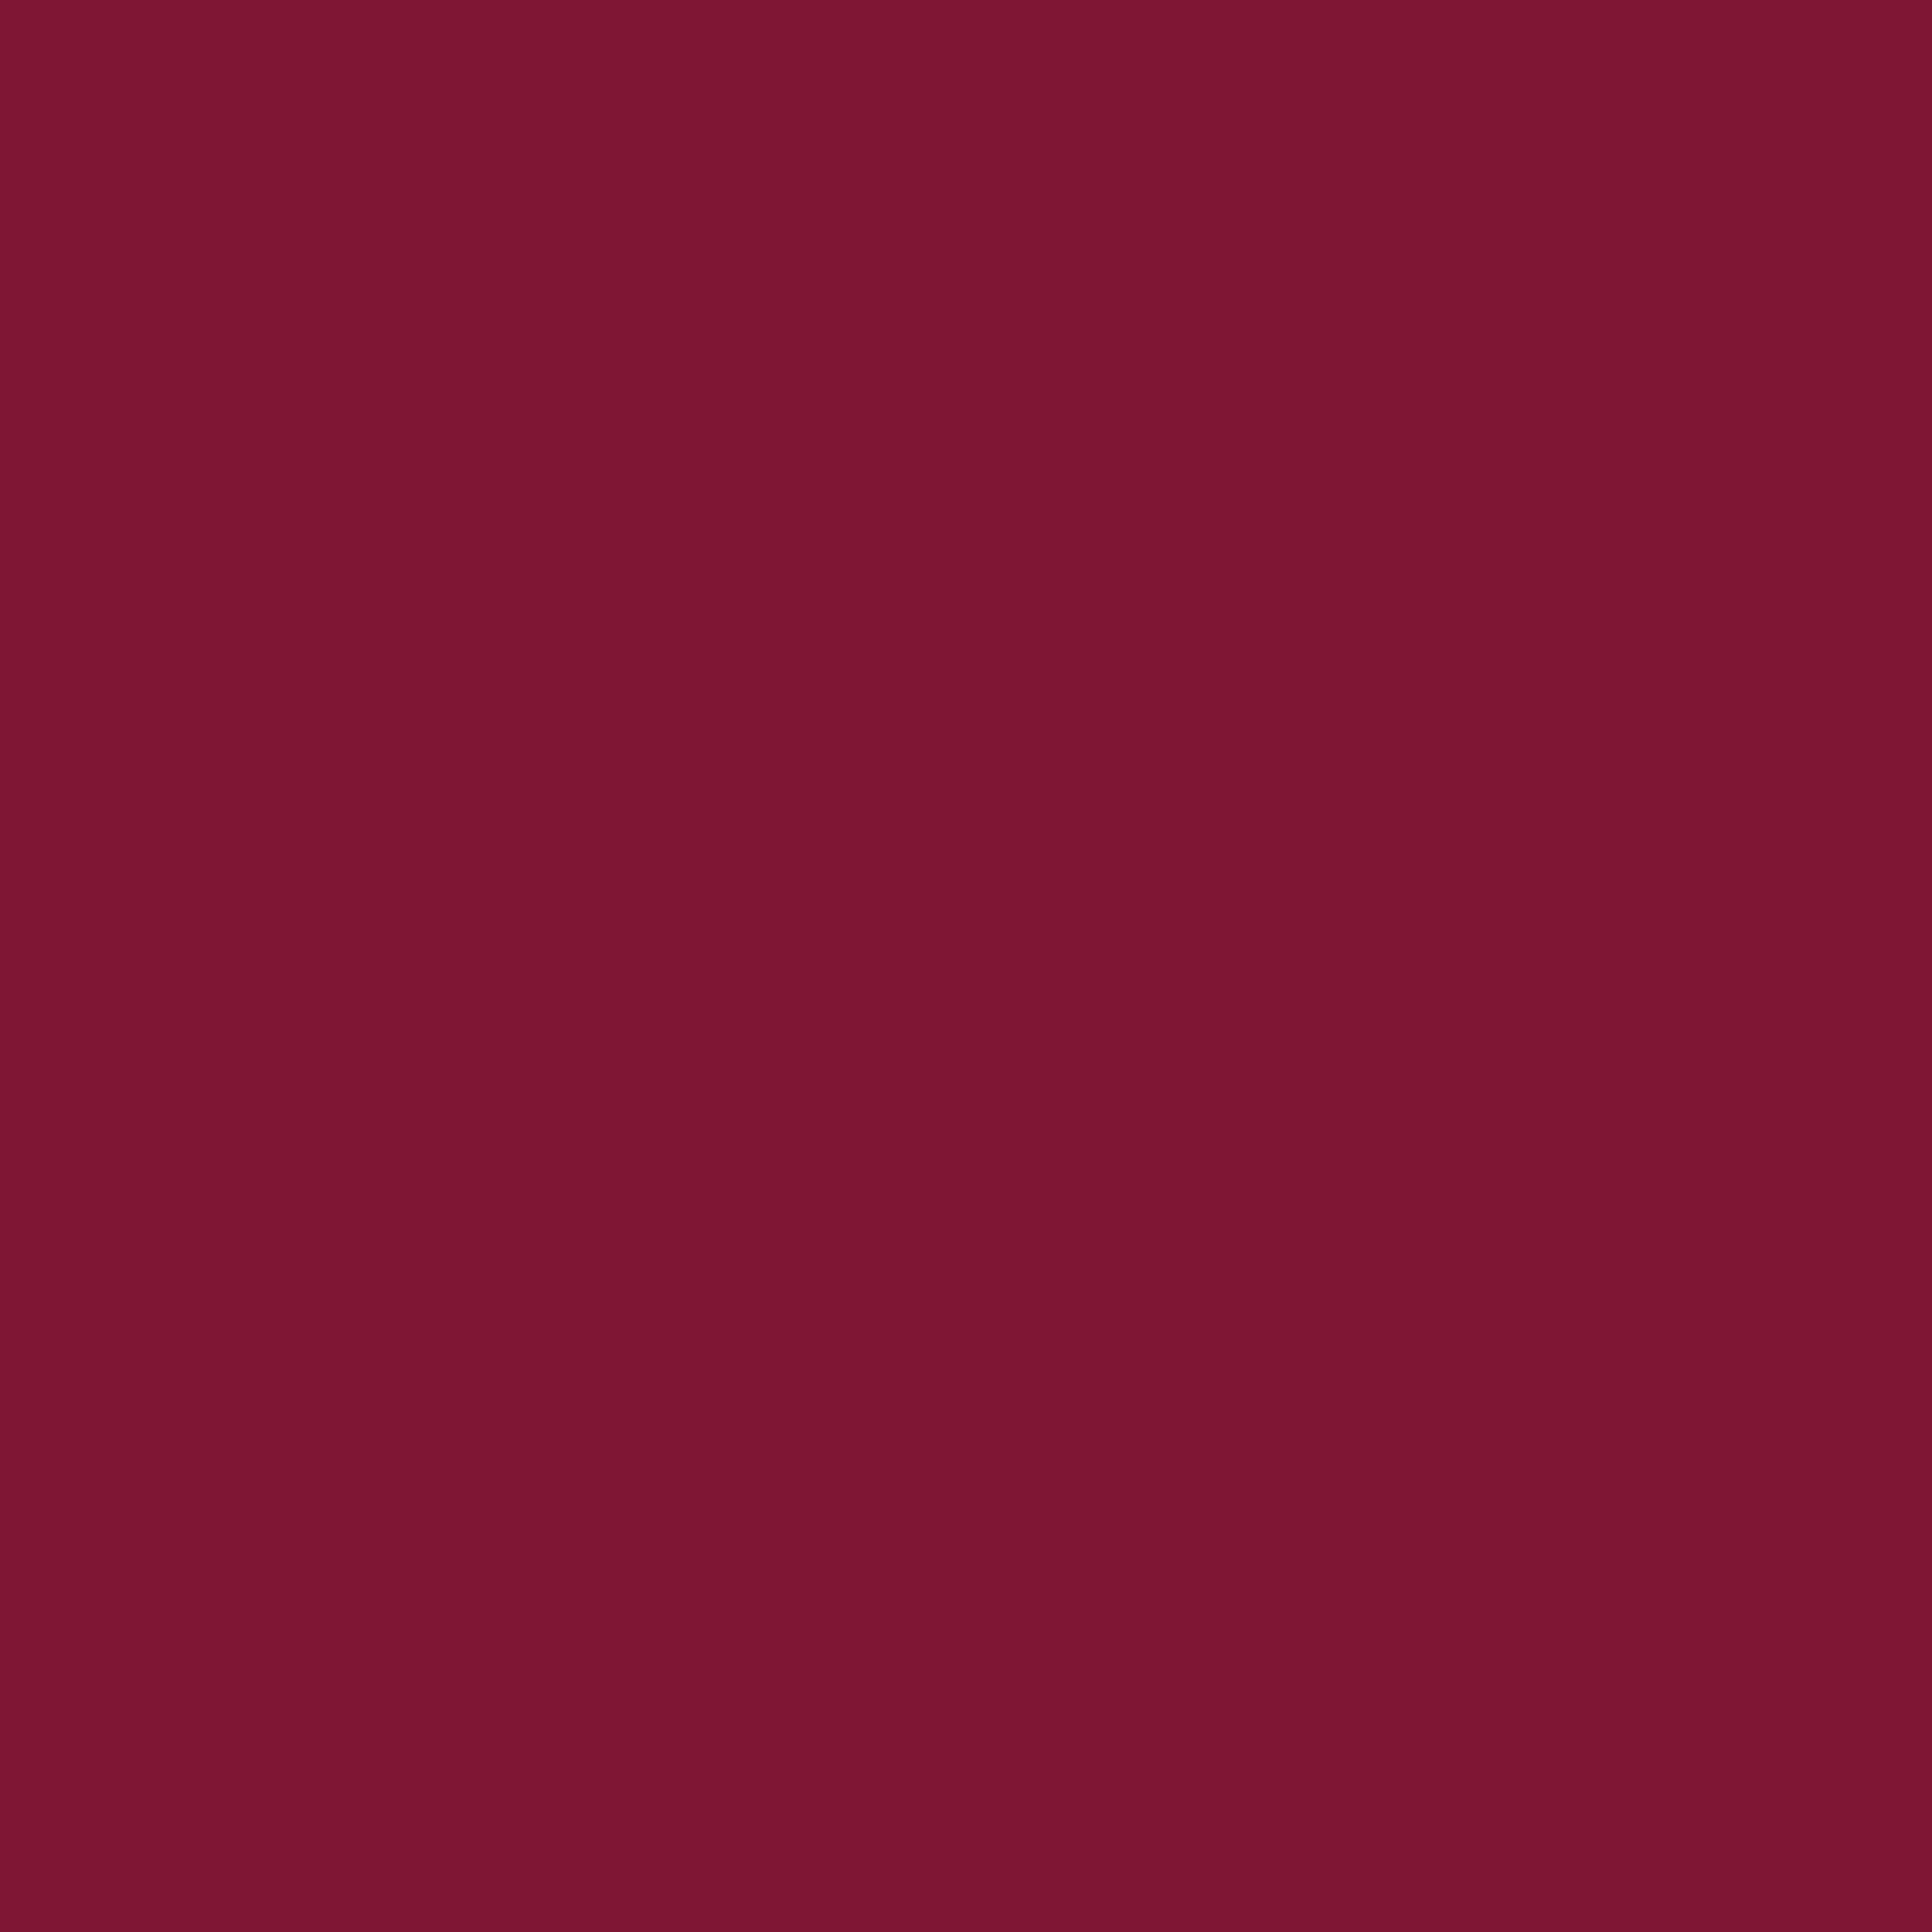 3600x3600 Claret Solid Color Background